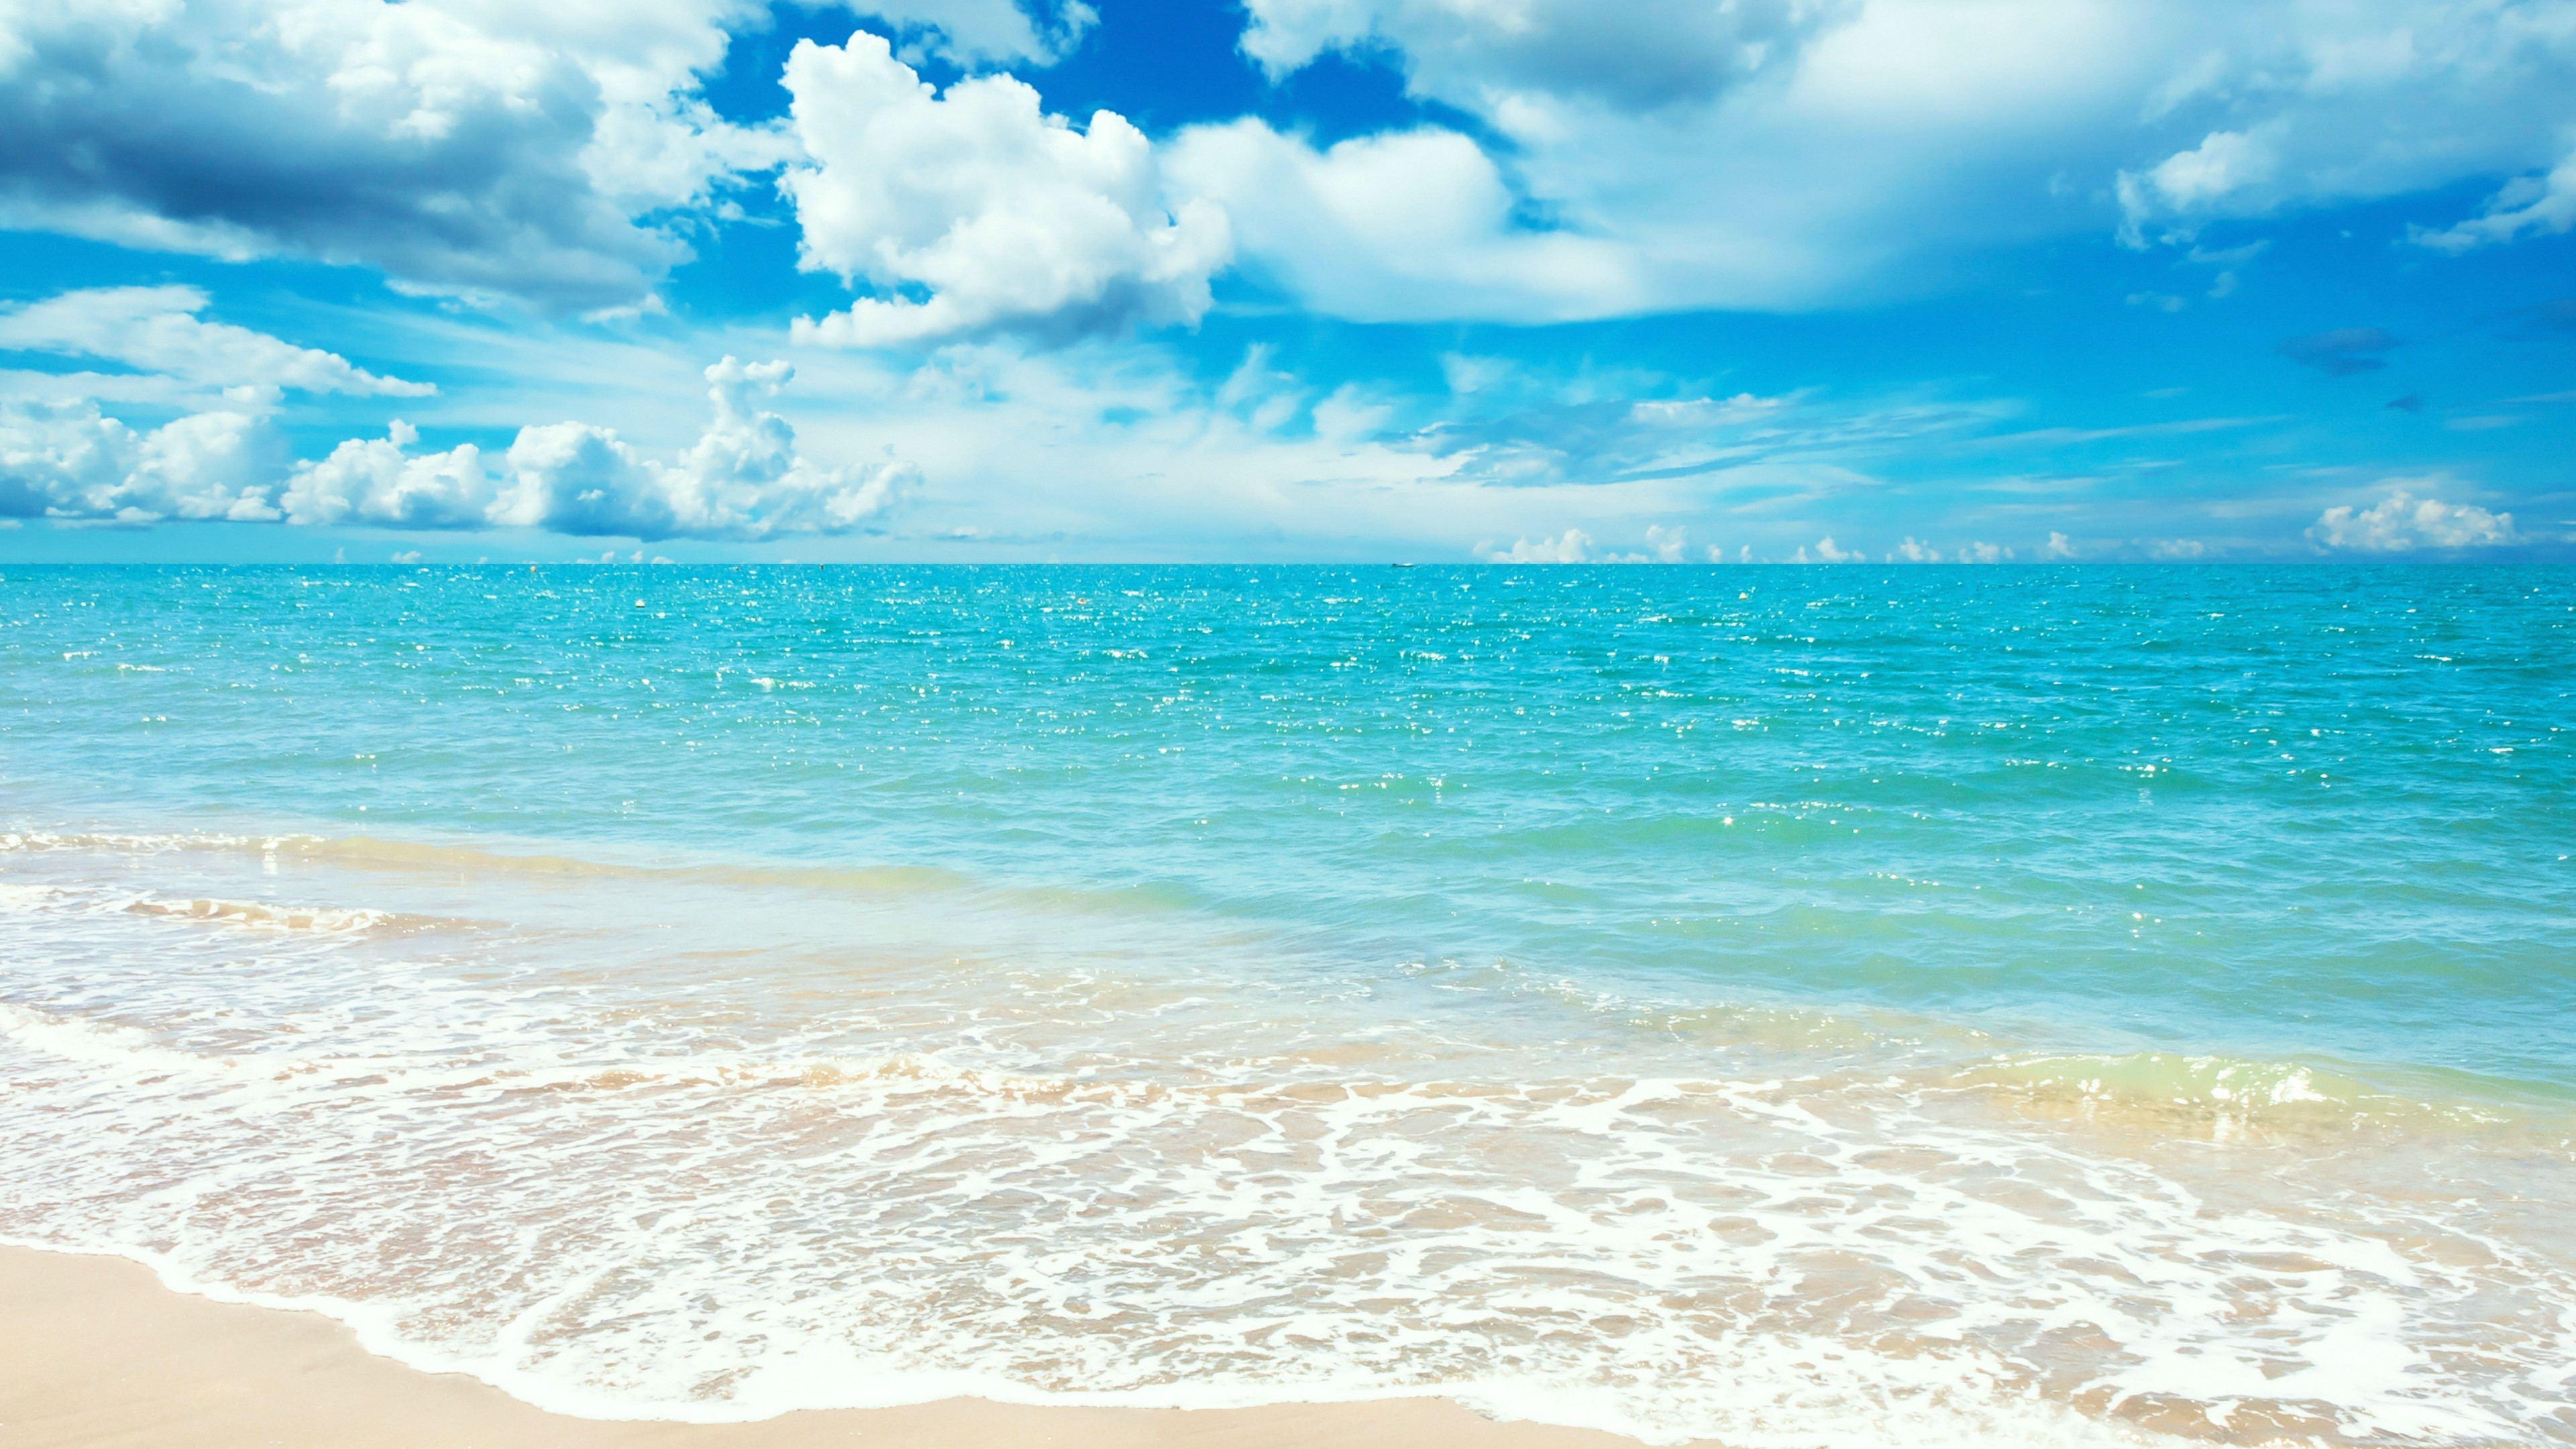 Wallpaper Ocean 5k 4k wallpaper 8k shore beach clouds sky 3840x2160